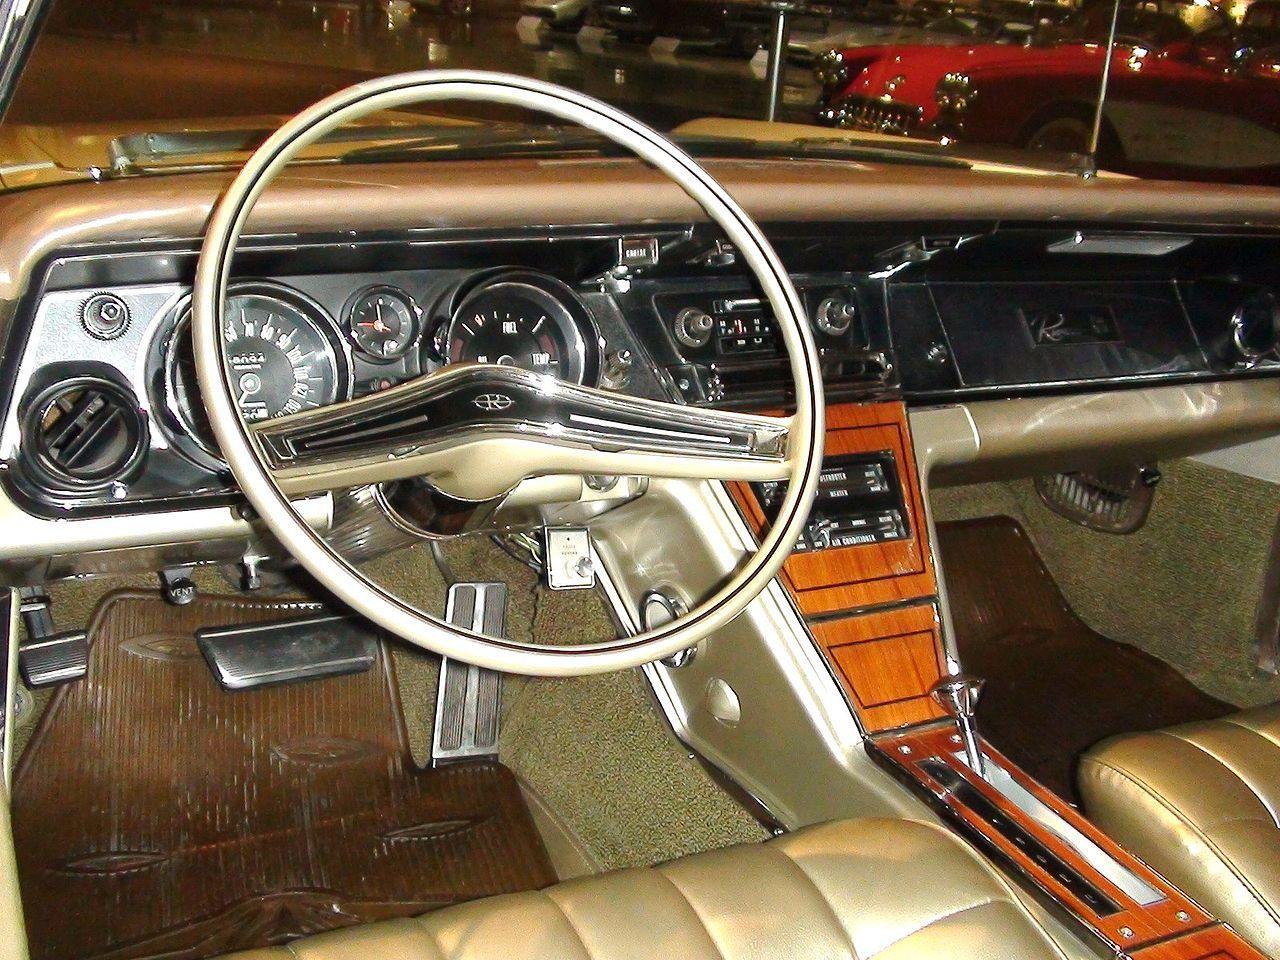 1965 Buick Riviera Gs Interior Buick Riviera Buick 1965 Buick Riviera